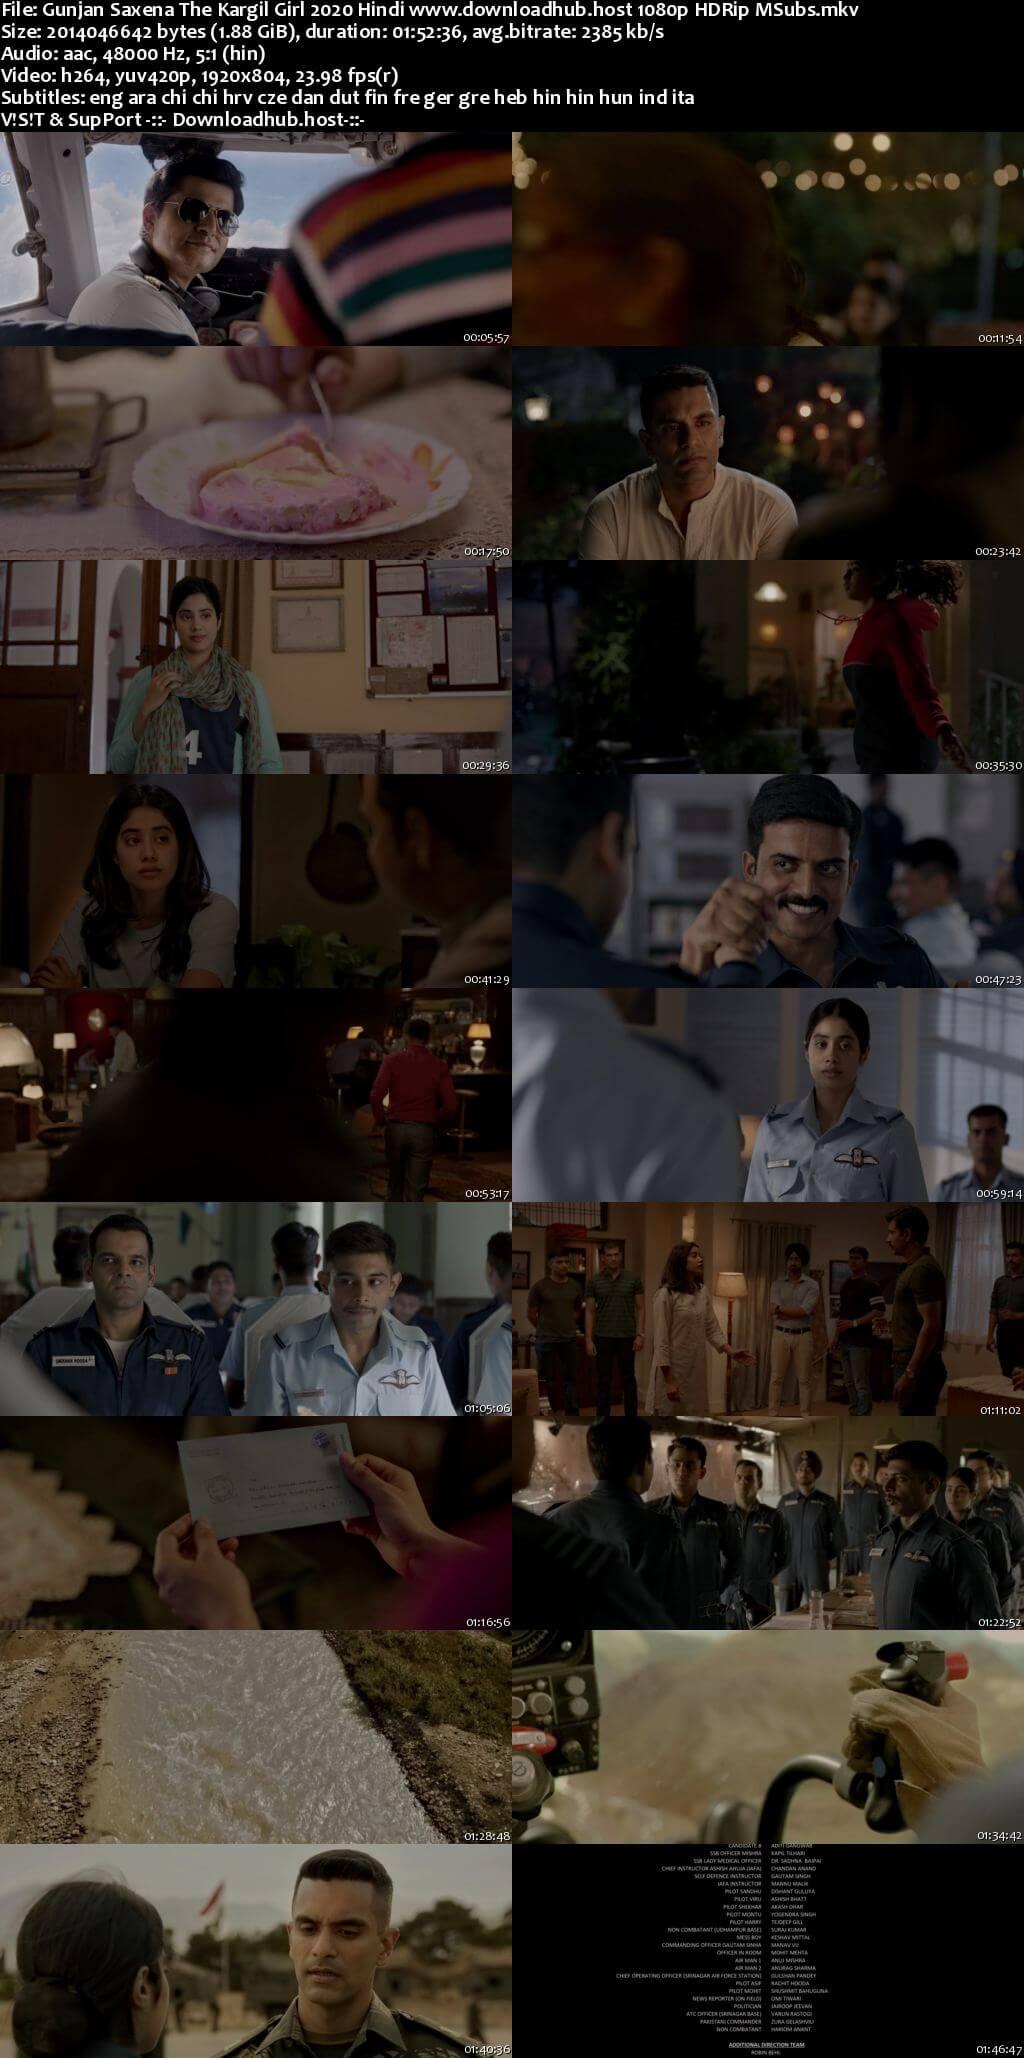 Gunjan Saxena The Kargil Girl 2020 Hindi 1080p HDRip MSubs